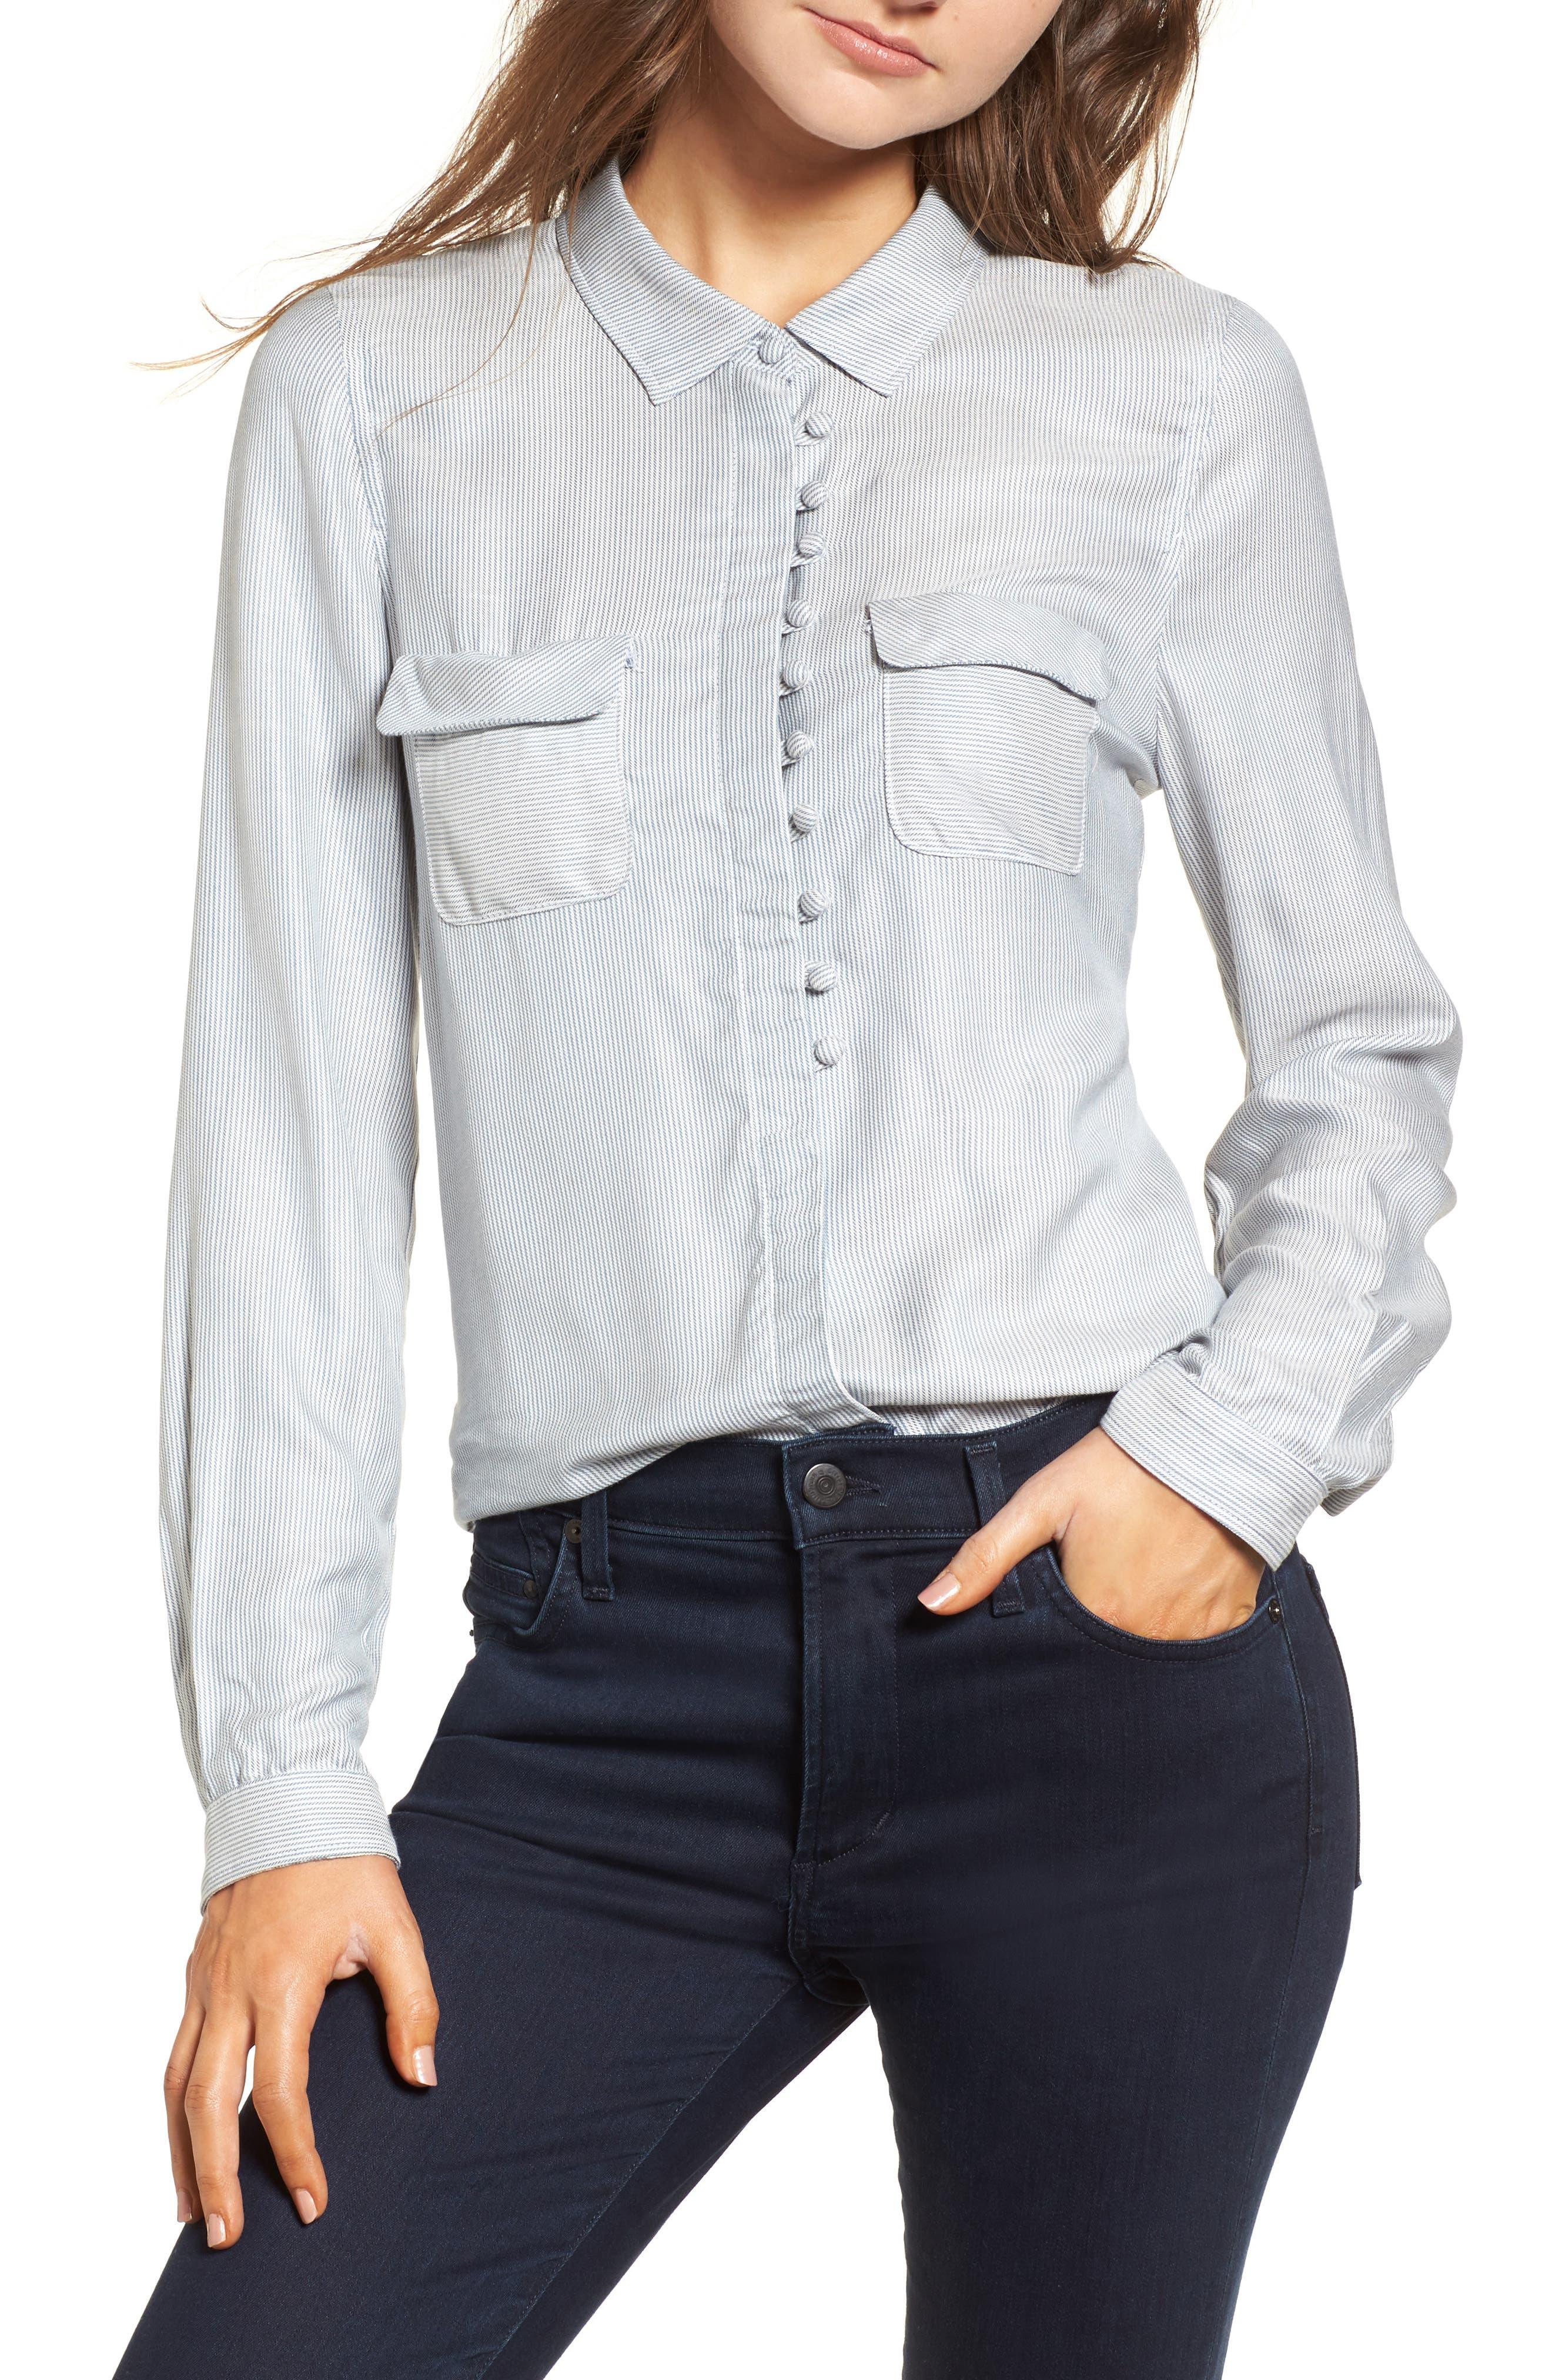 Berea Shirt,                             Main thumbnail 1, color,                             450